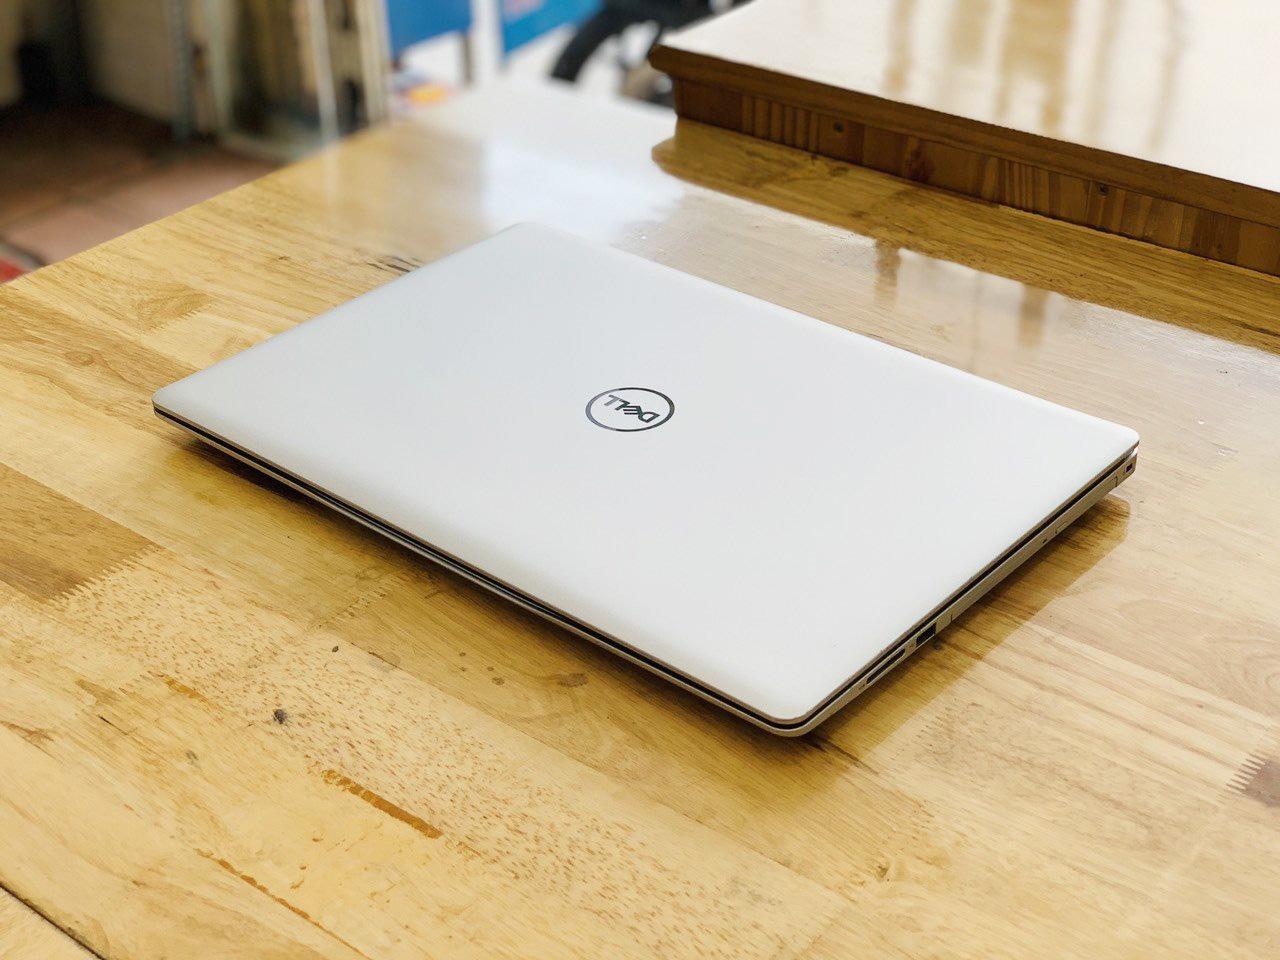 Dell inspiron 5570 i7